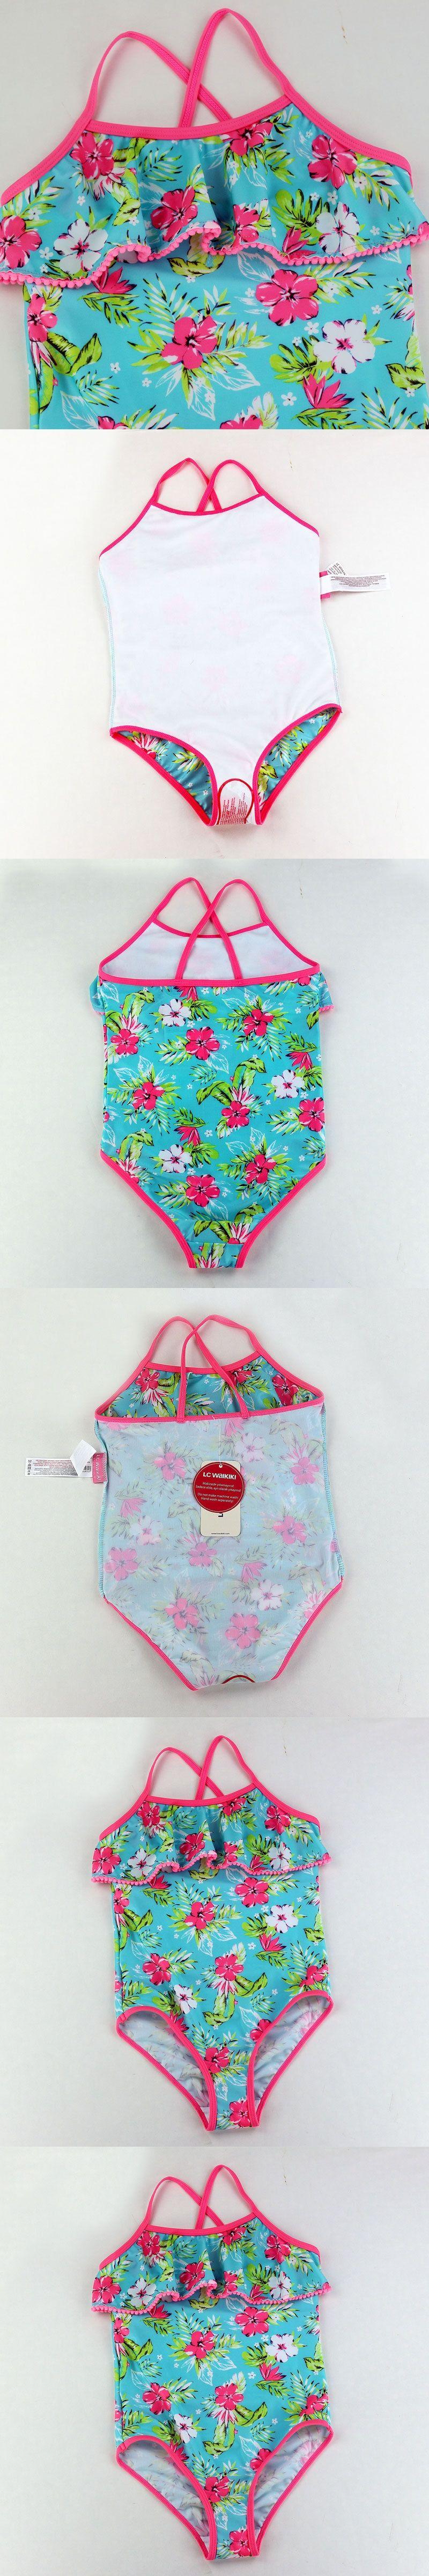 Children Bathing Suit Retail Cute Children s Swimsuit Girls Flowers